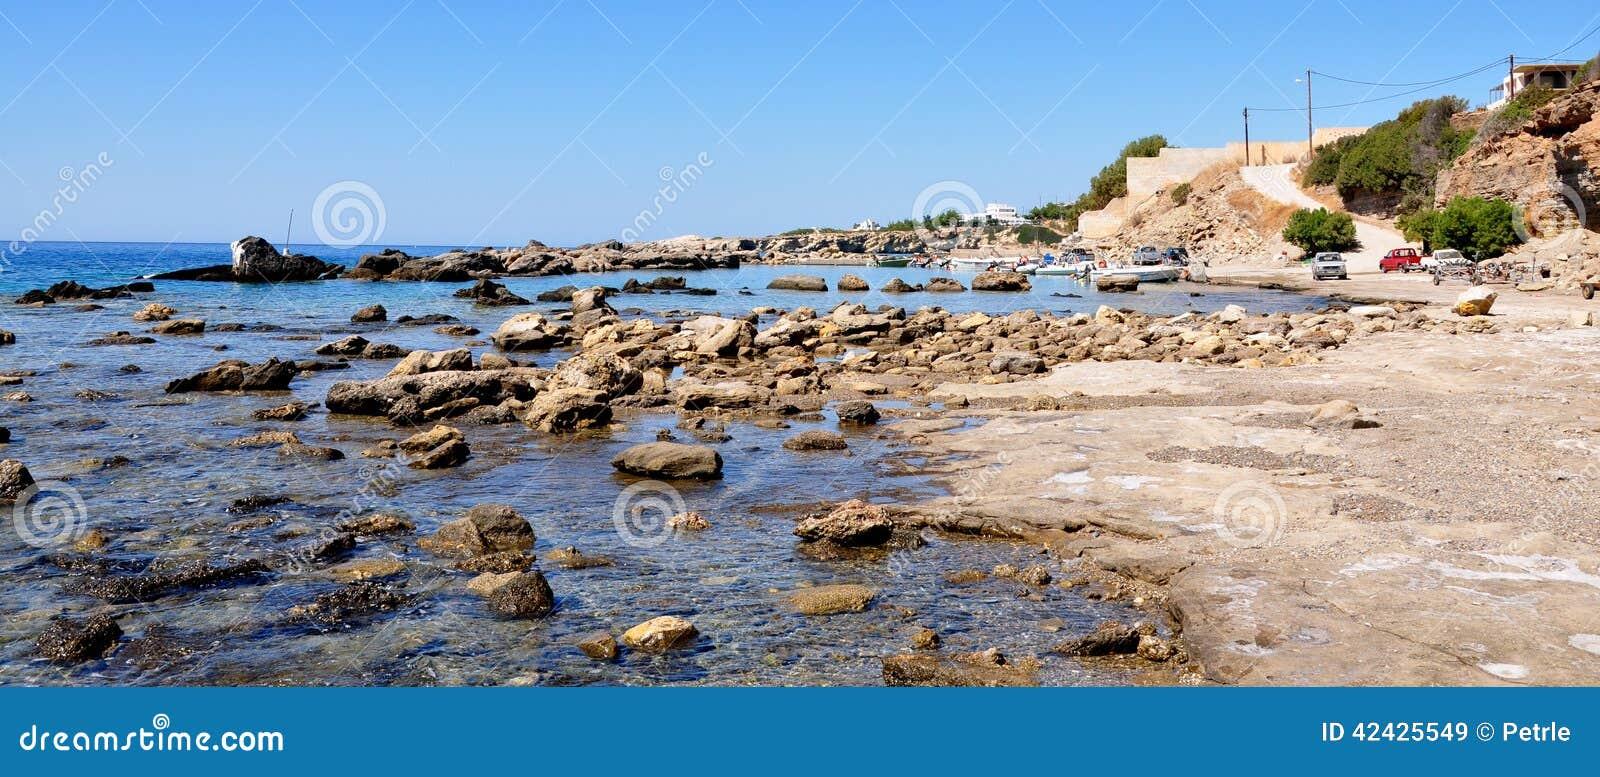 Costa de la isla de Creta, Grecia, Europa